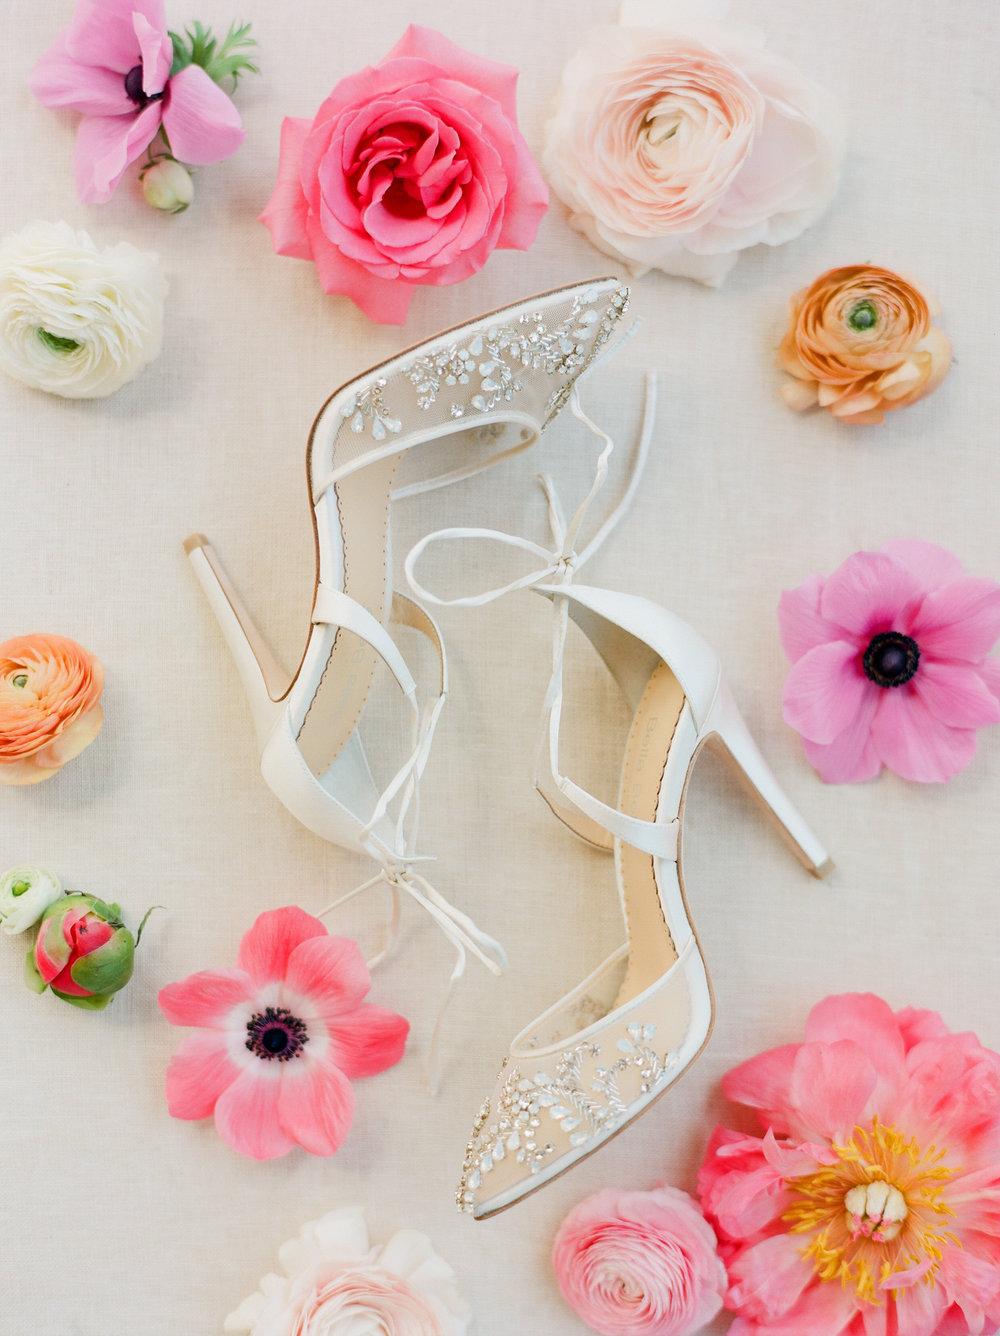 The-Knot-50-Weddings-50-States-Texas-Winner-Dana-Fernandez-photography-houston-wedding-photographer-film-fine-art-destination-3.jpg